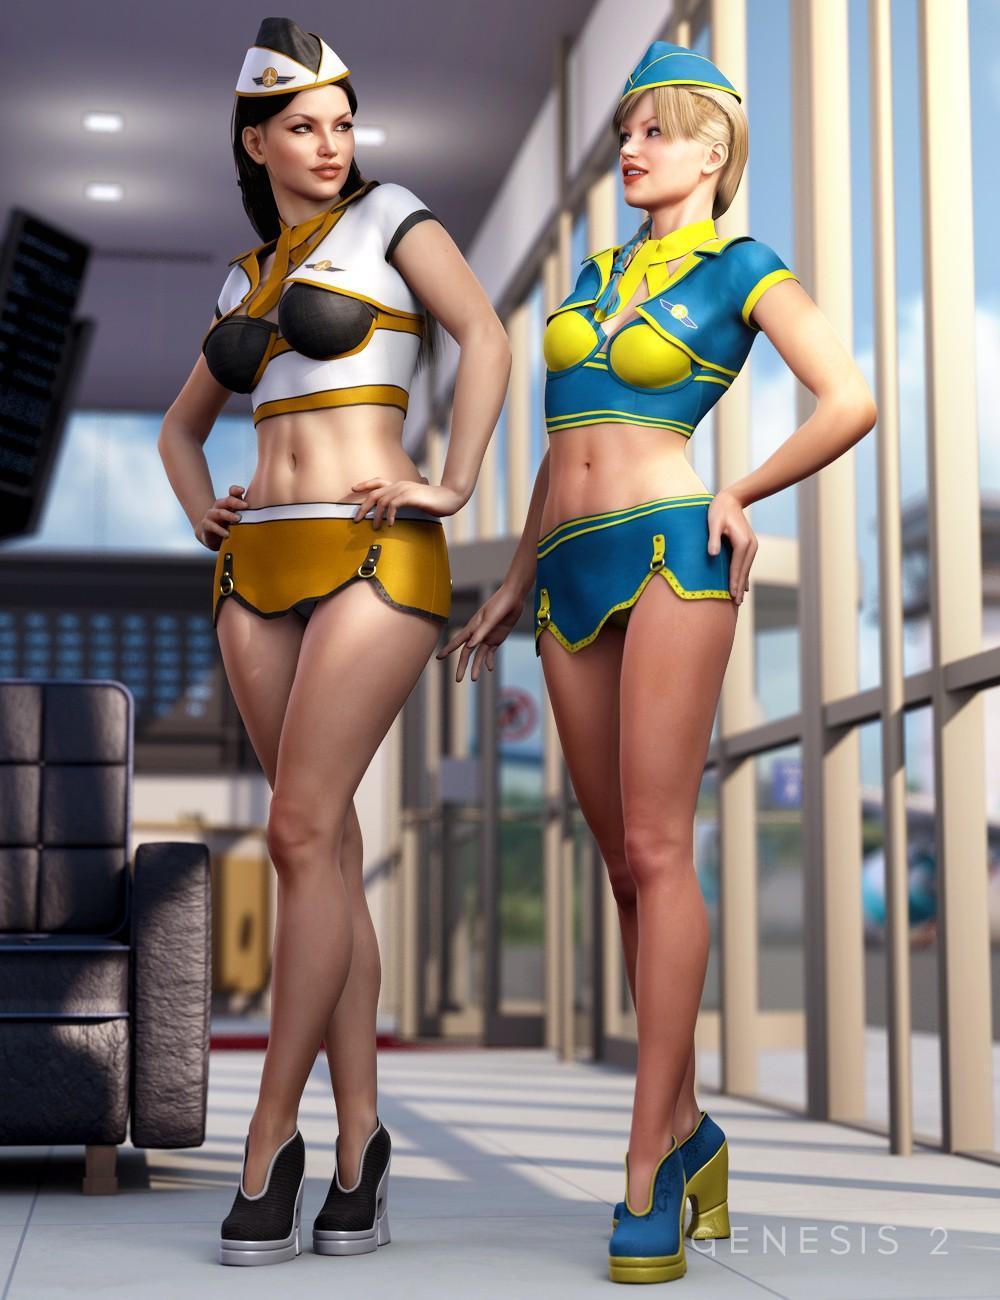 Sexy Stewardess Textures